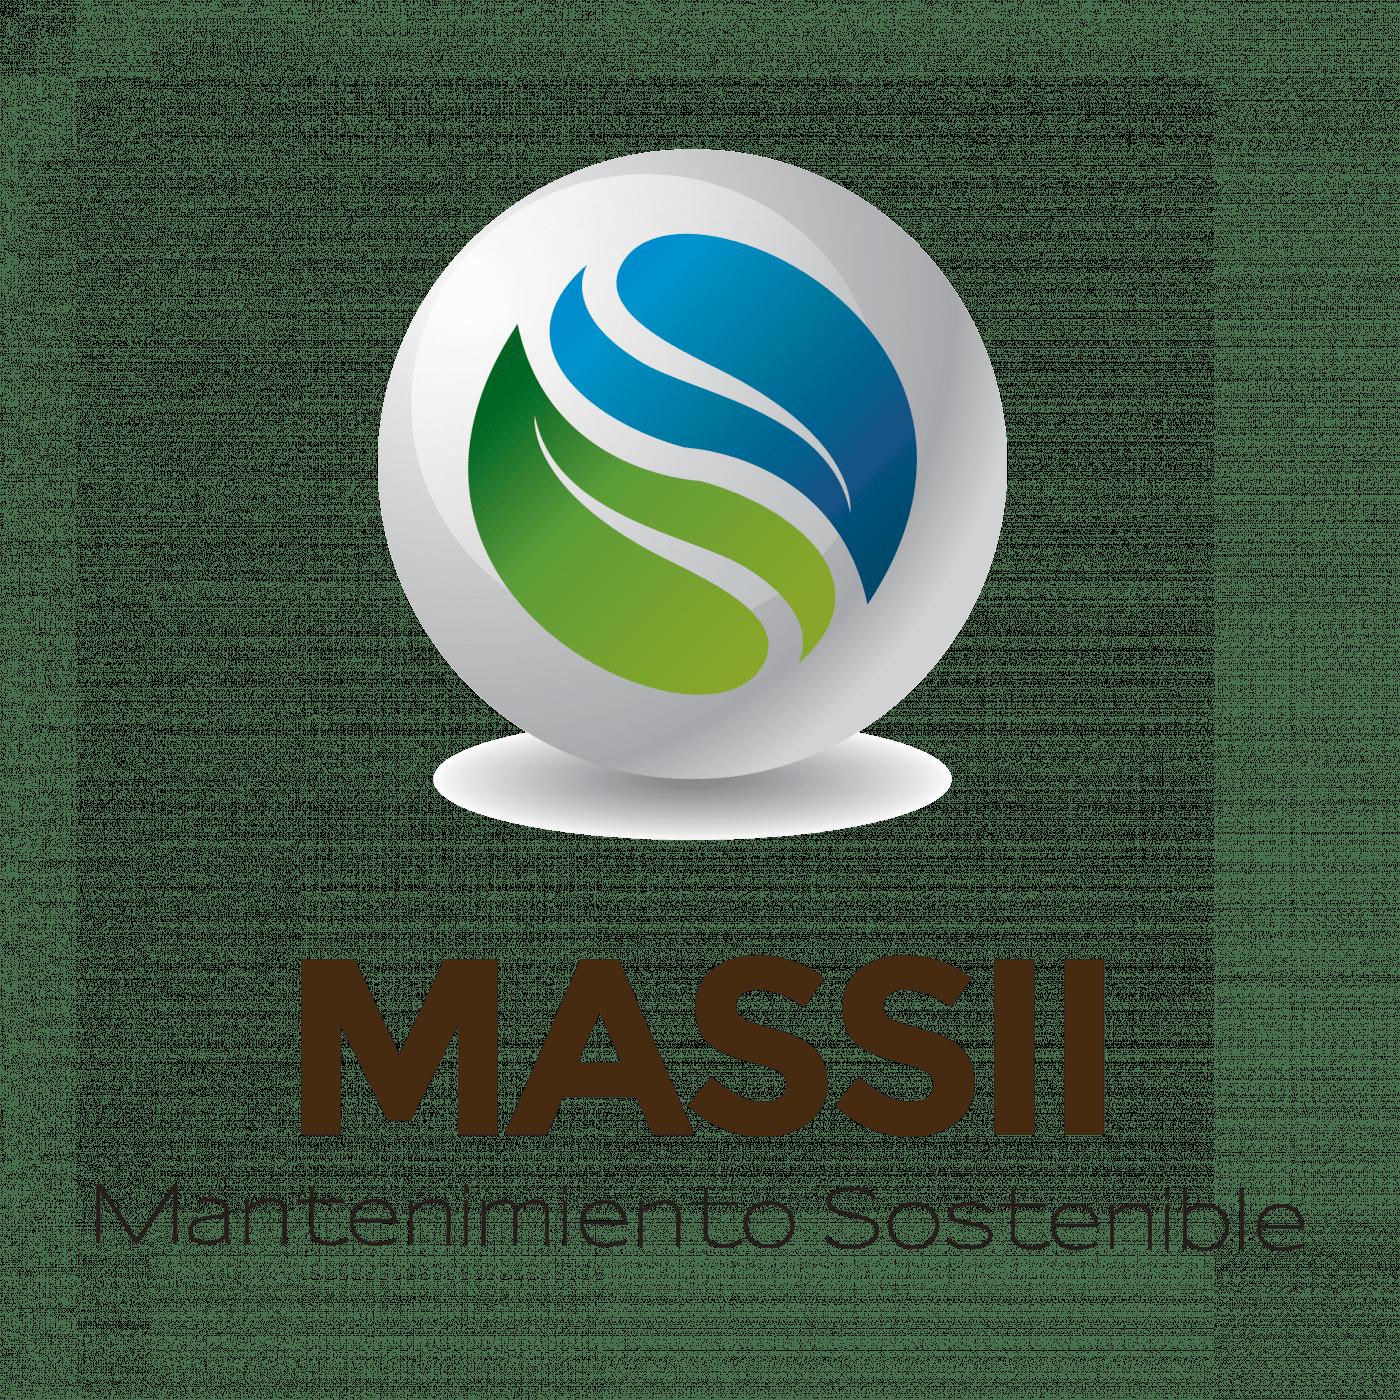 Massii - Mantenimiento Sostenible Integral